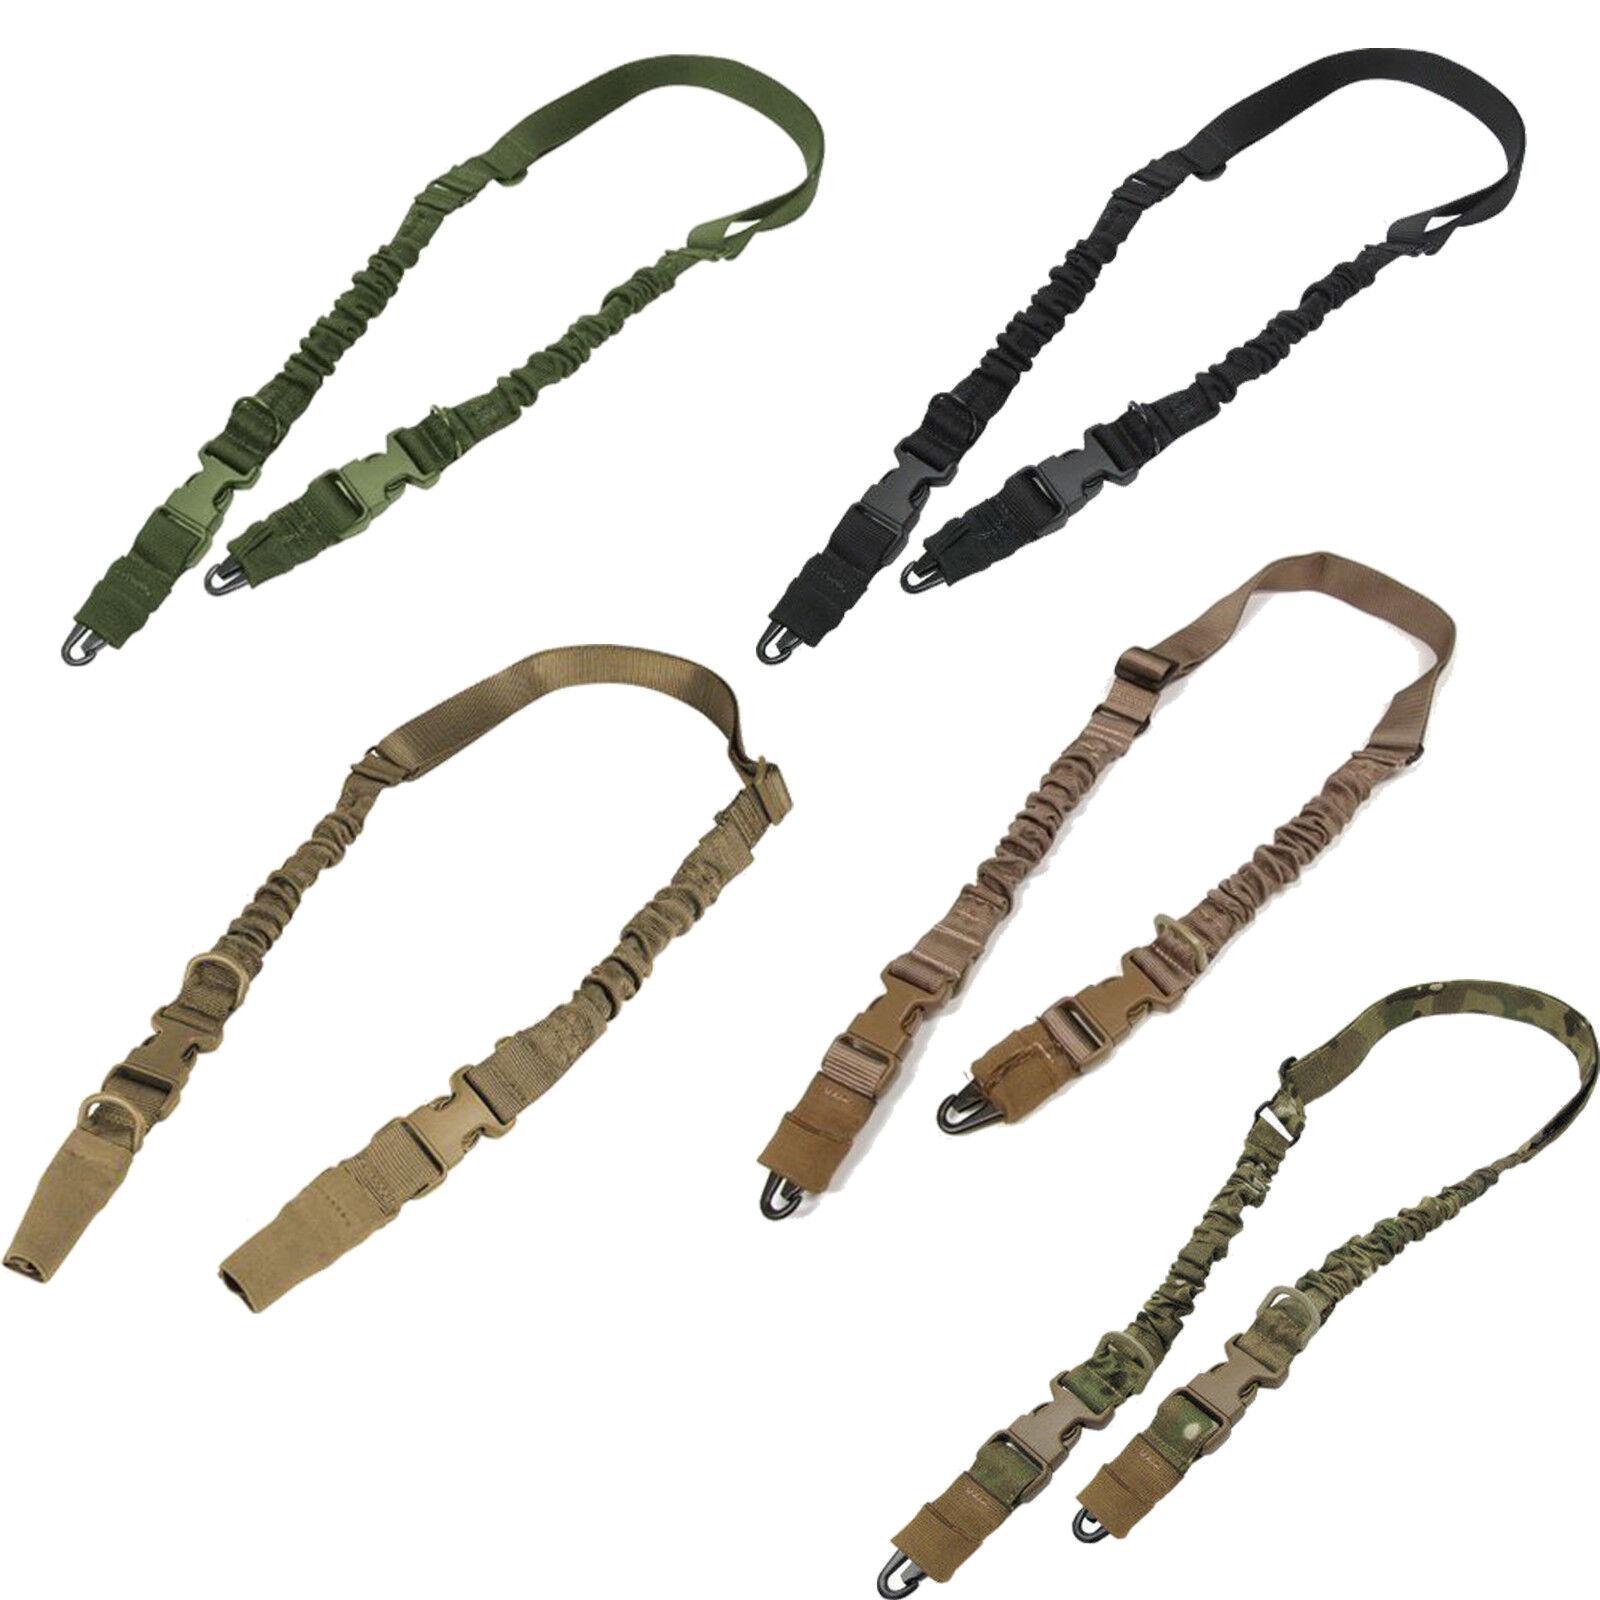 Condor US1002 COBRA CBT Single & Dual Point  Bungee Rifle Sling Strap HK Hook  online retailers